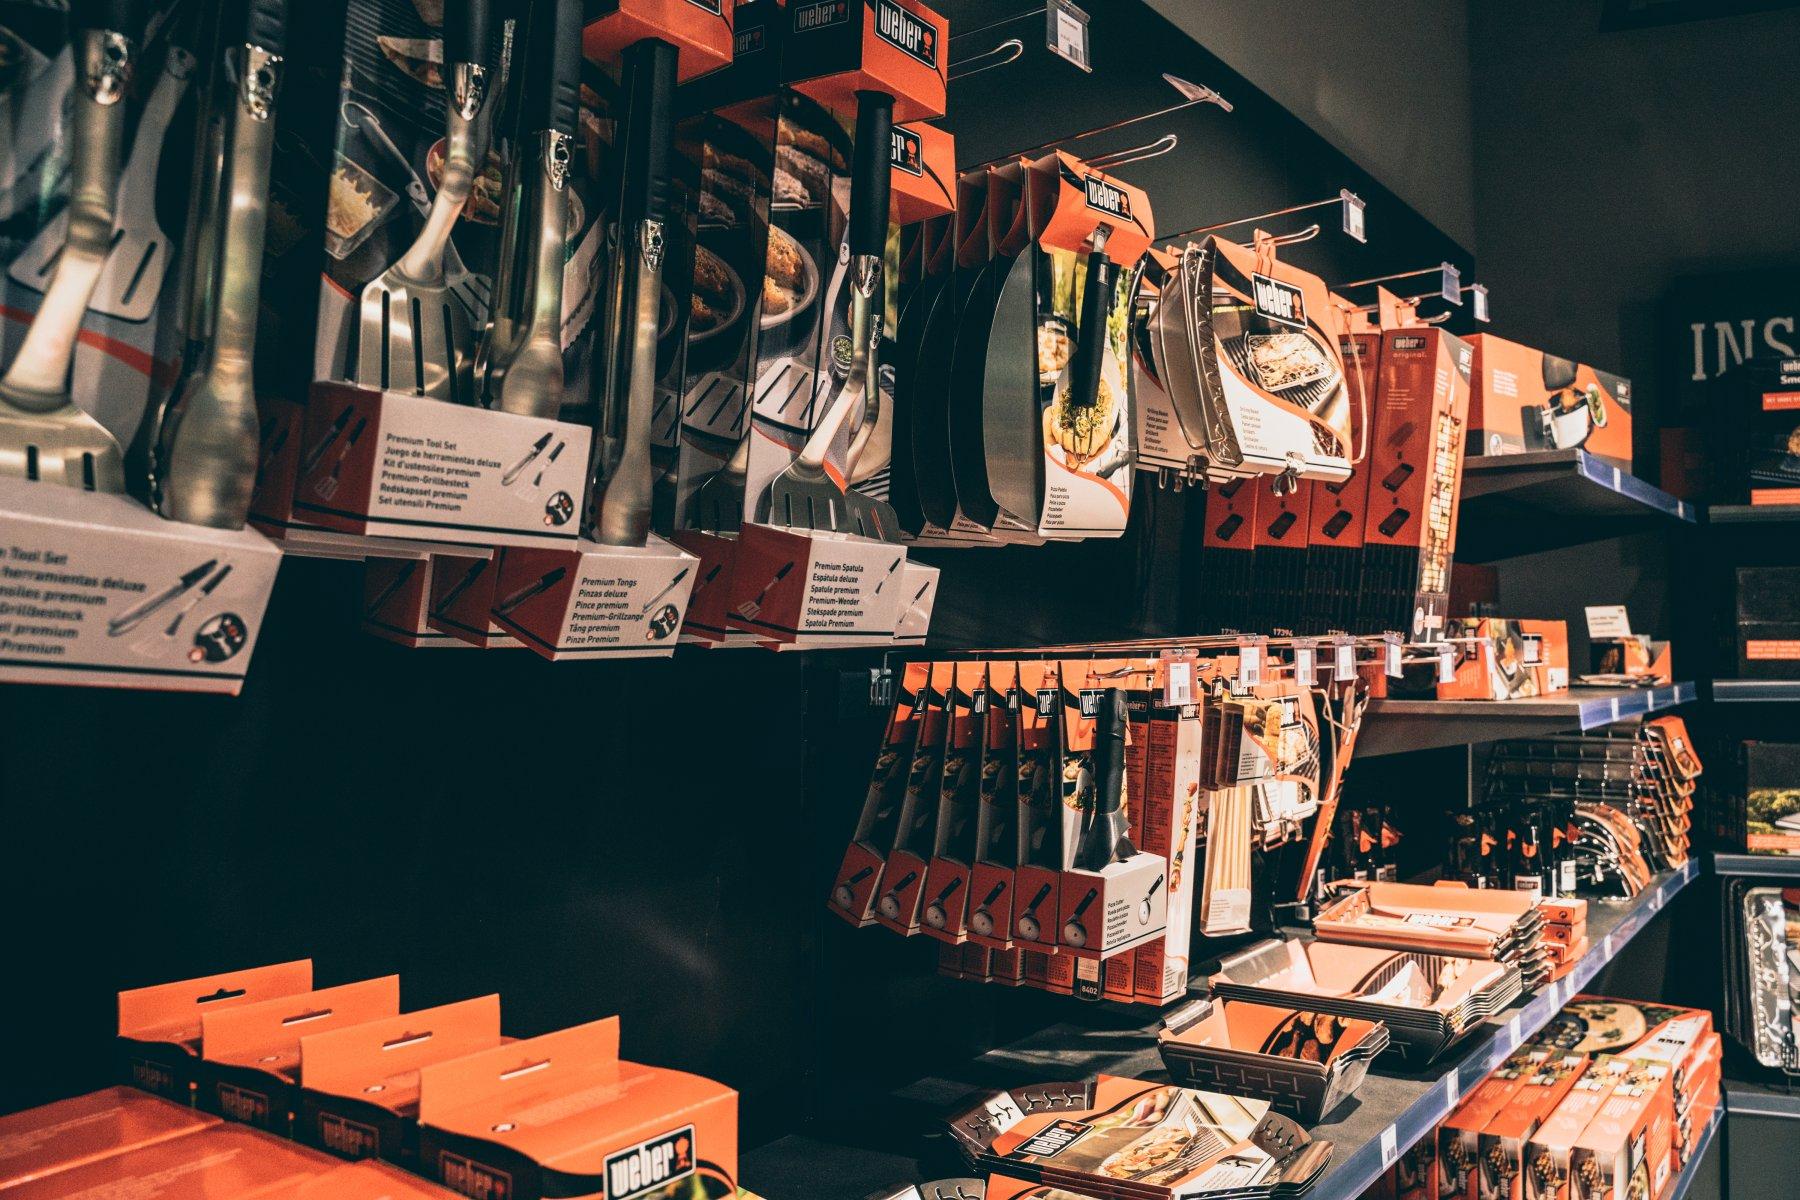 geheimtipp muenchen weber store grill09138 – ©wunderland media GmbH